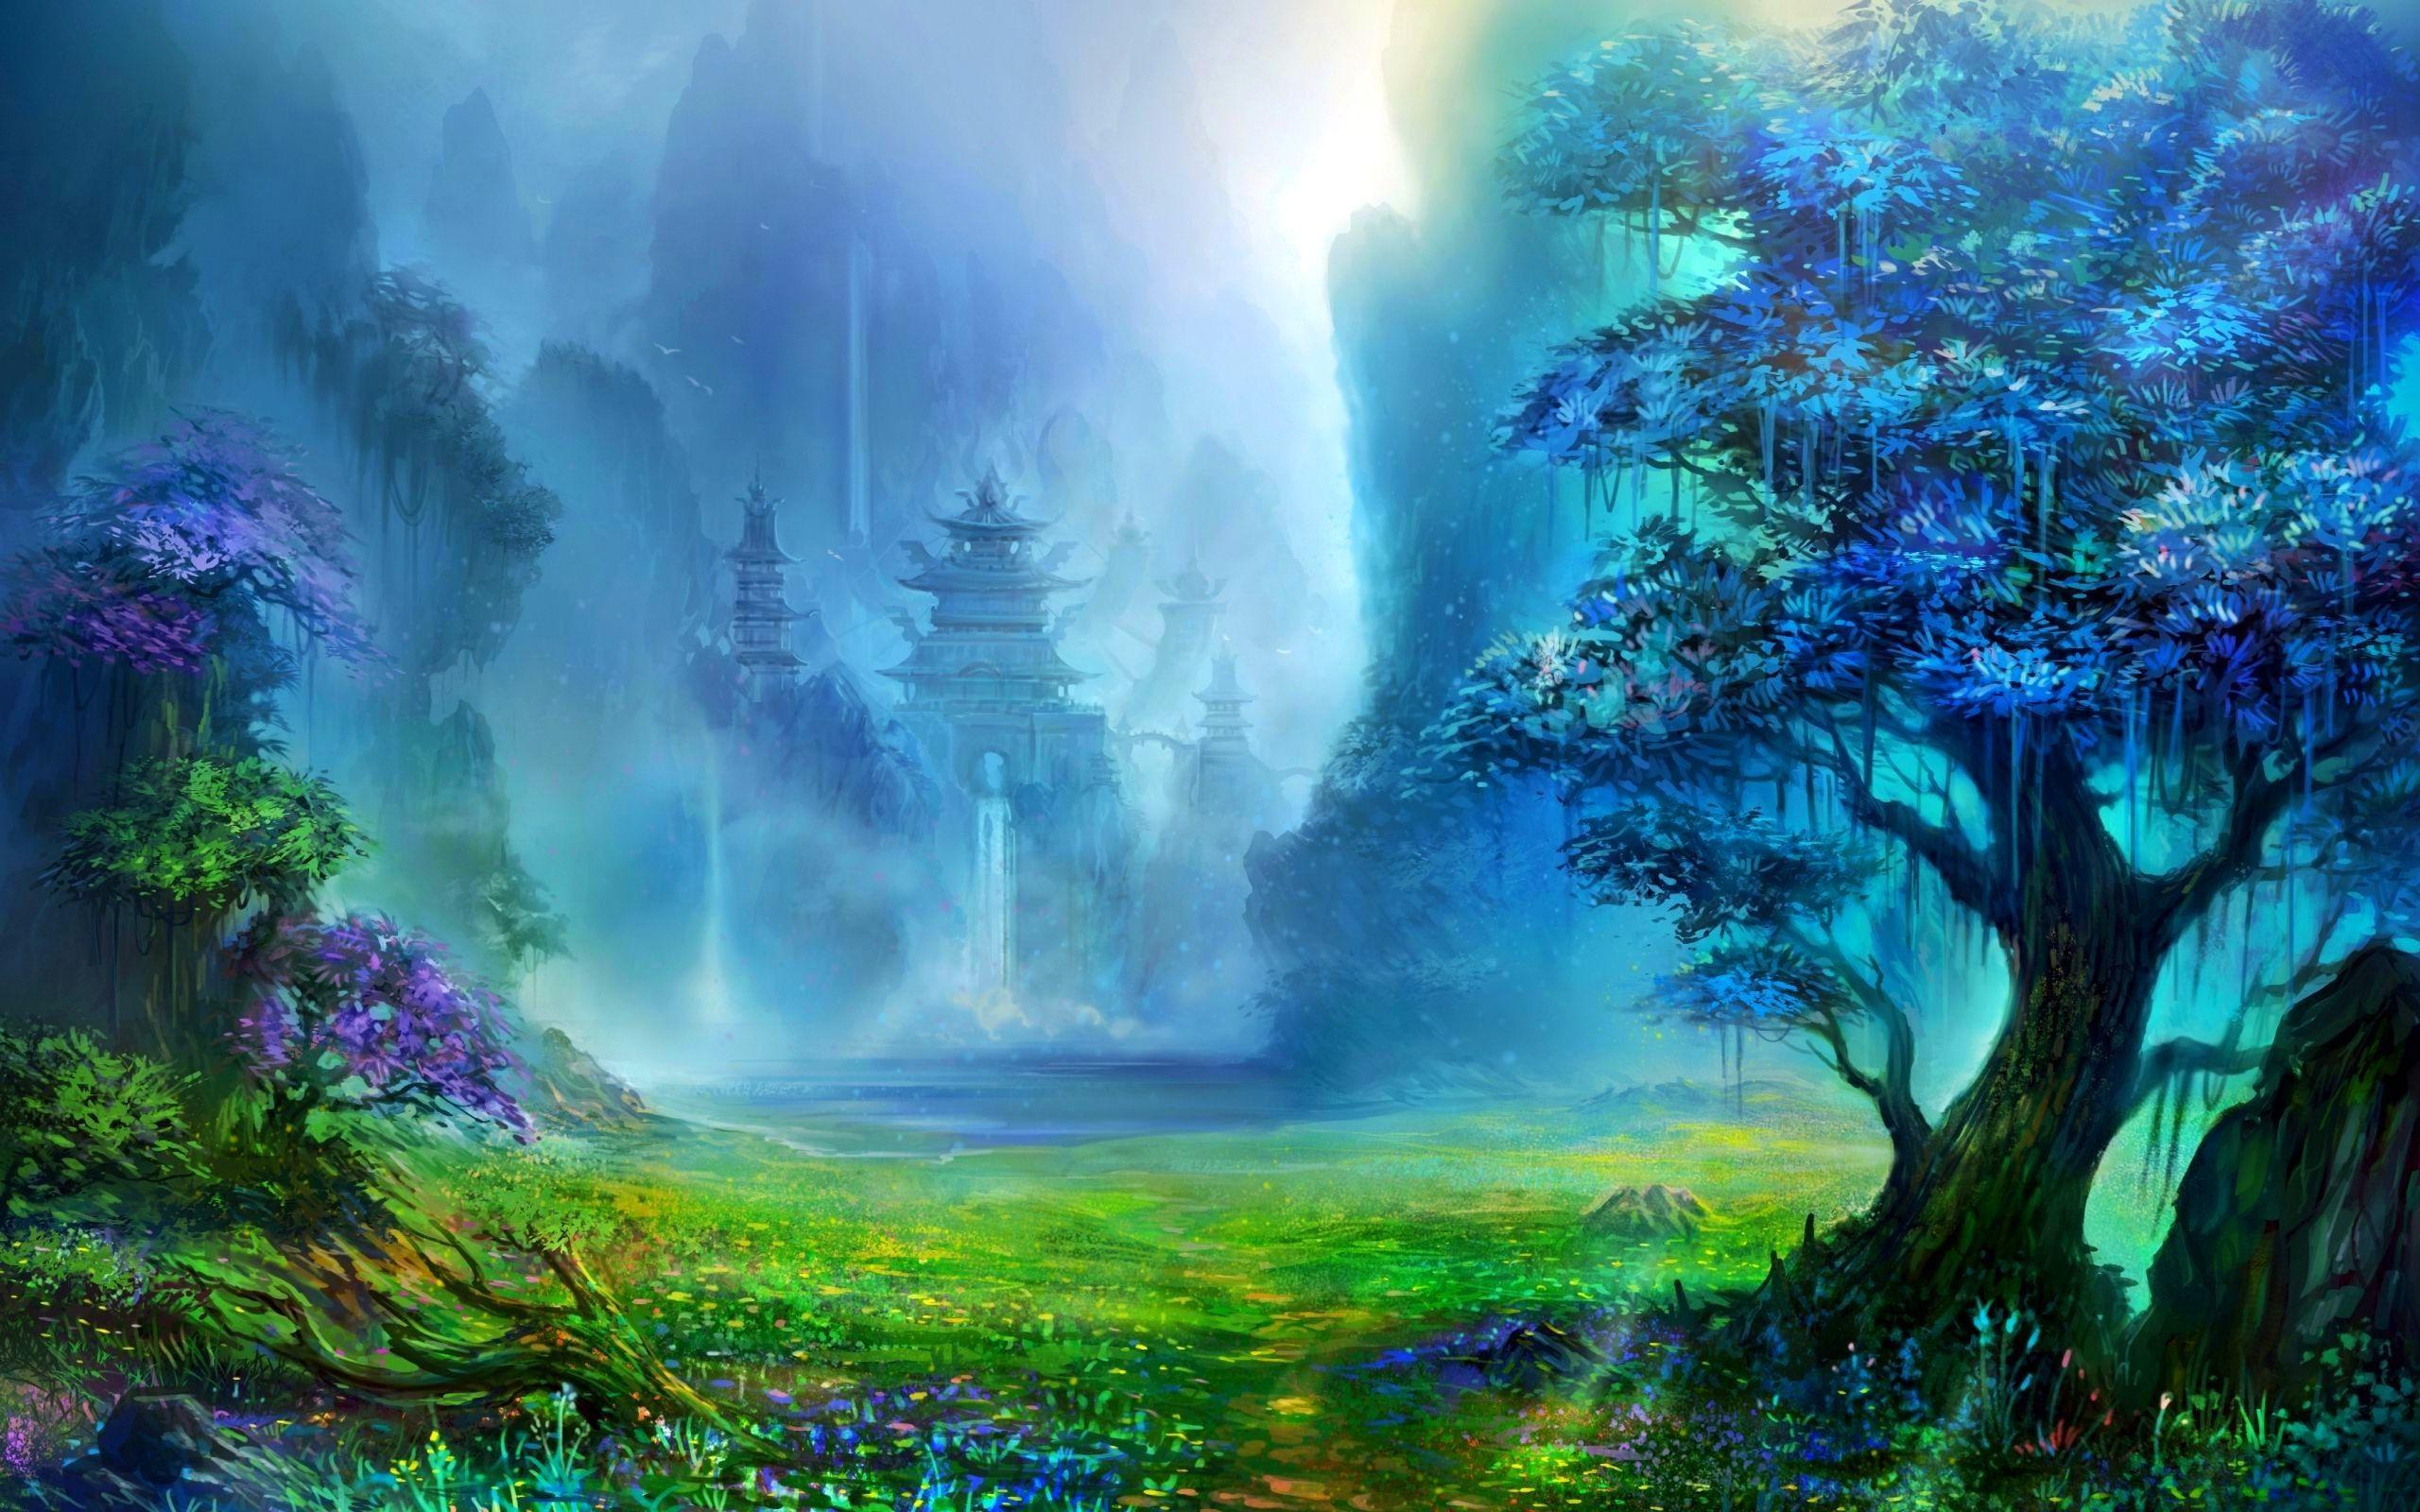 Fantasy Art Pagoda Asian Architecture Trees Waterfall Artwork Mountain Digital Art Nature L Fantasy Landscape Fantasy Art Landscapes Waterfall Artwork